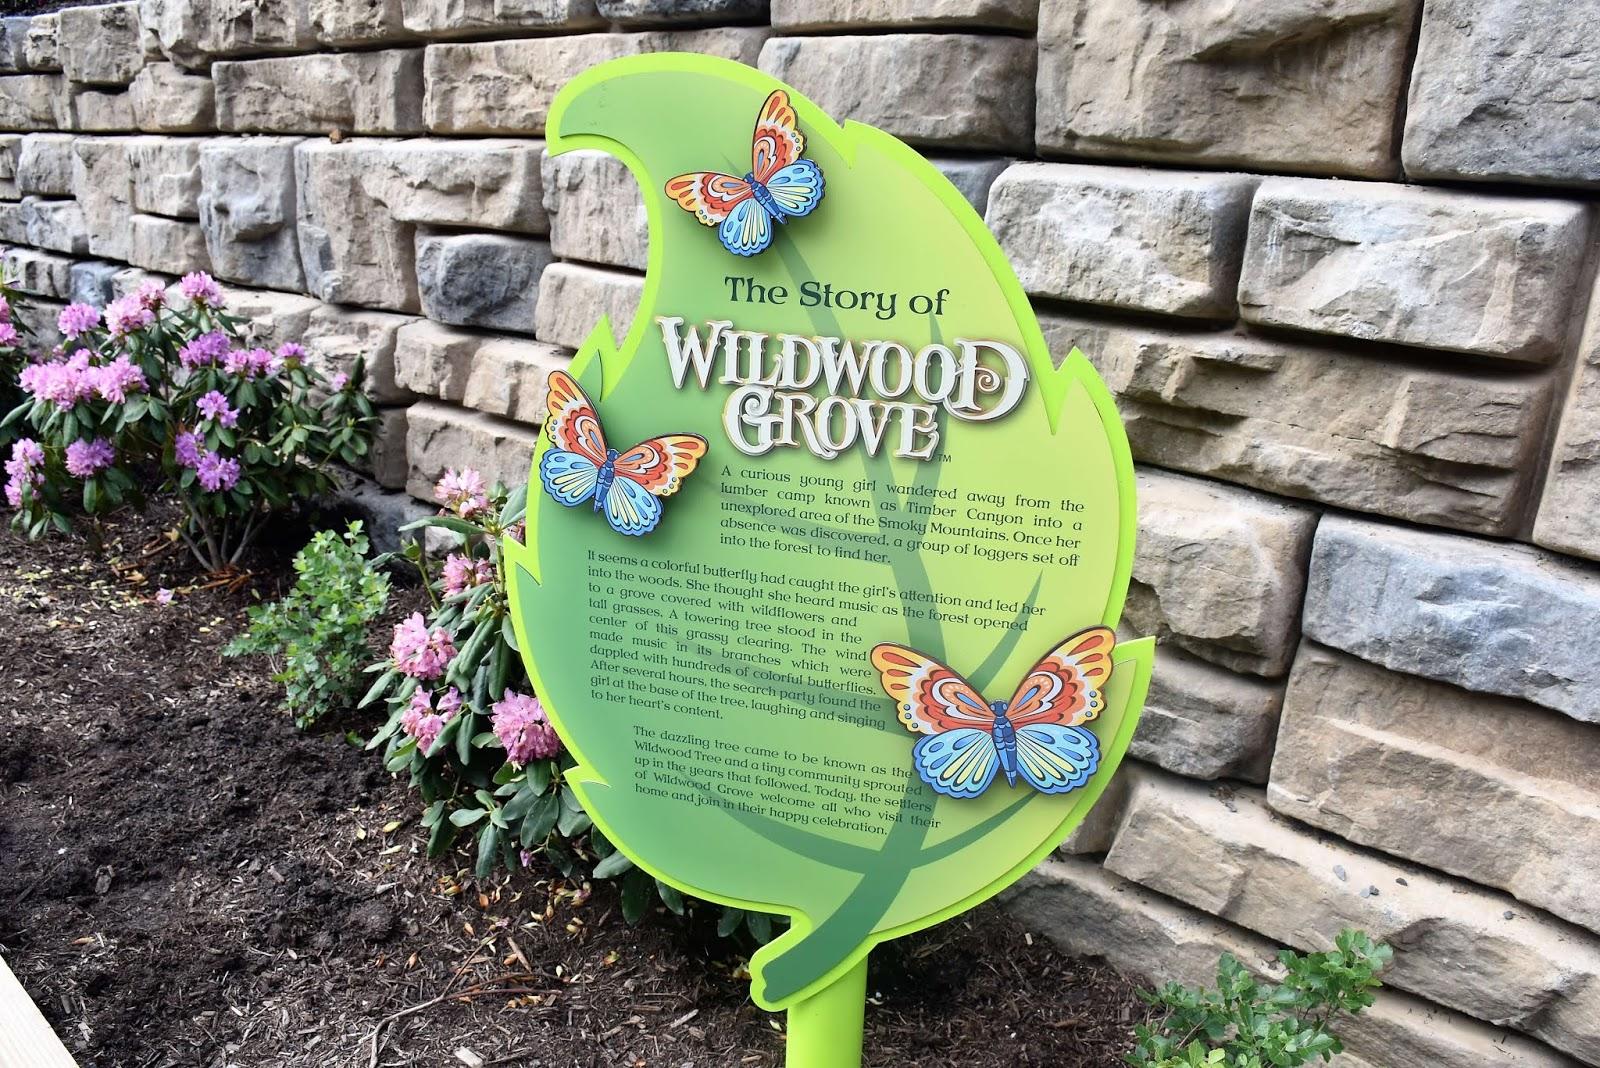 Wildwood Grove at Dollywood